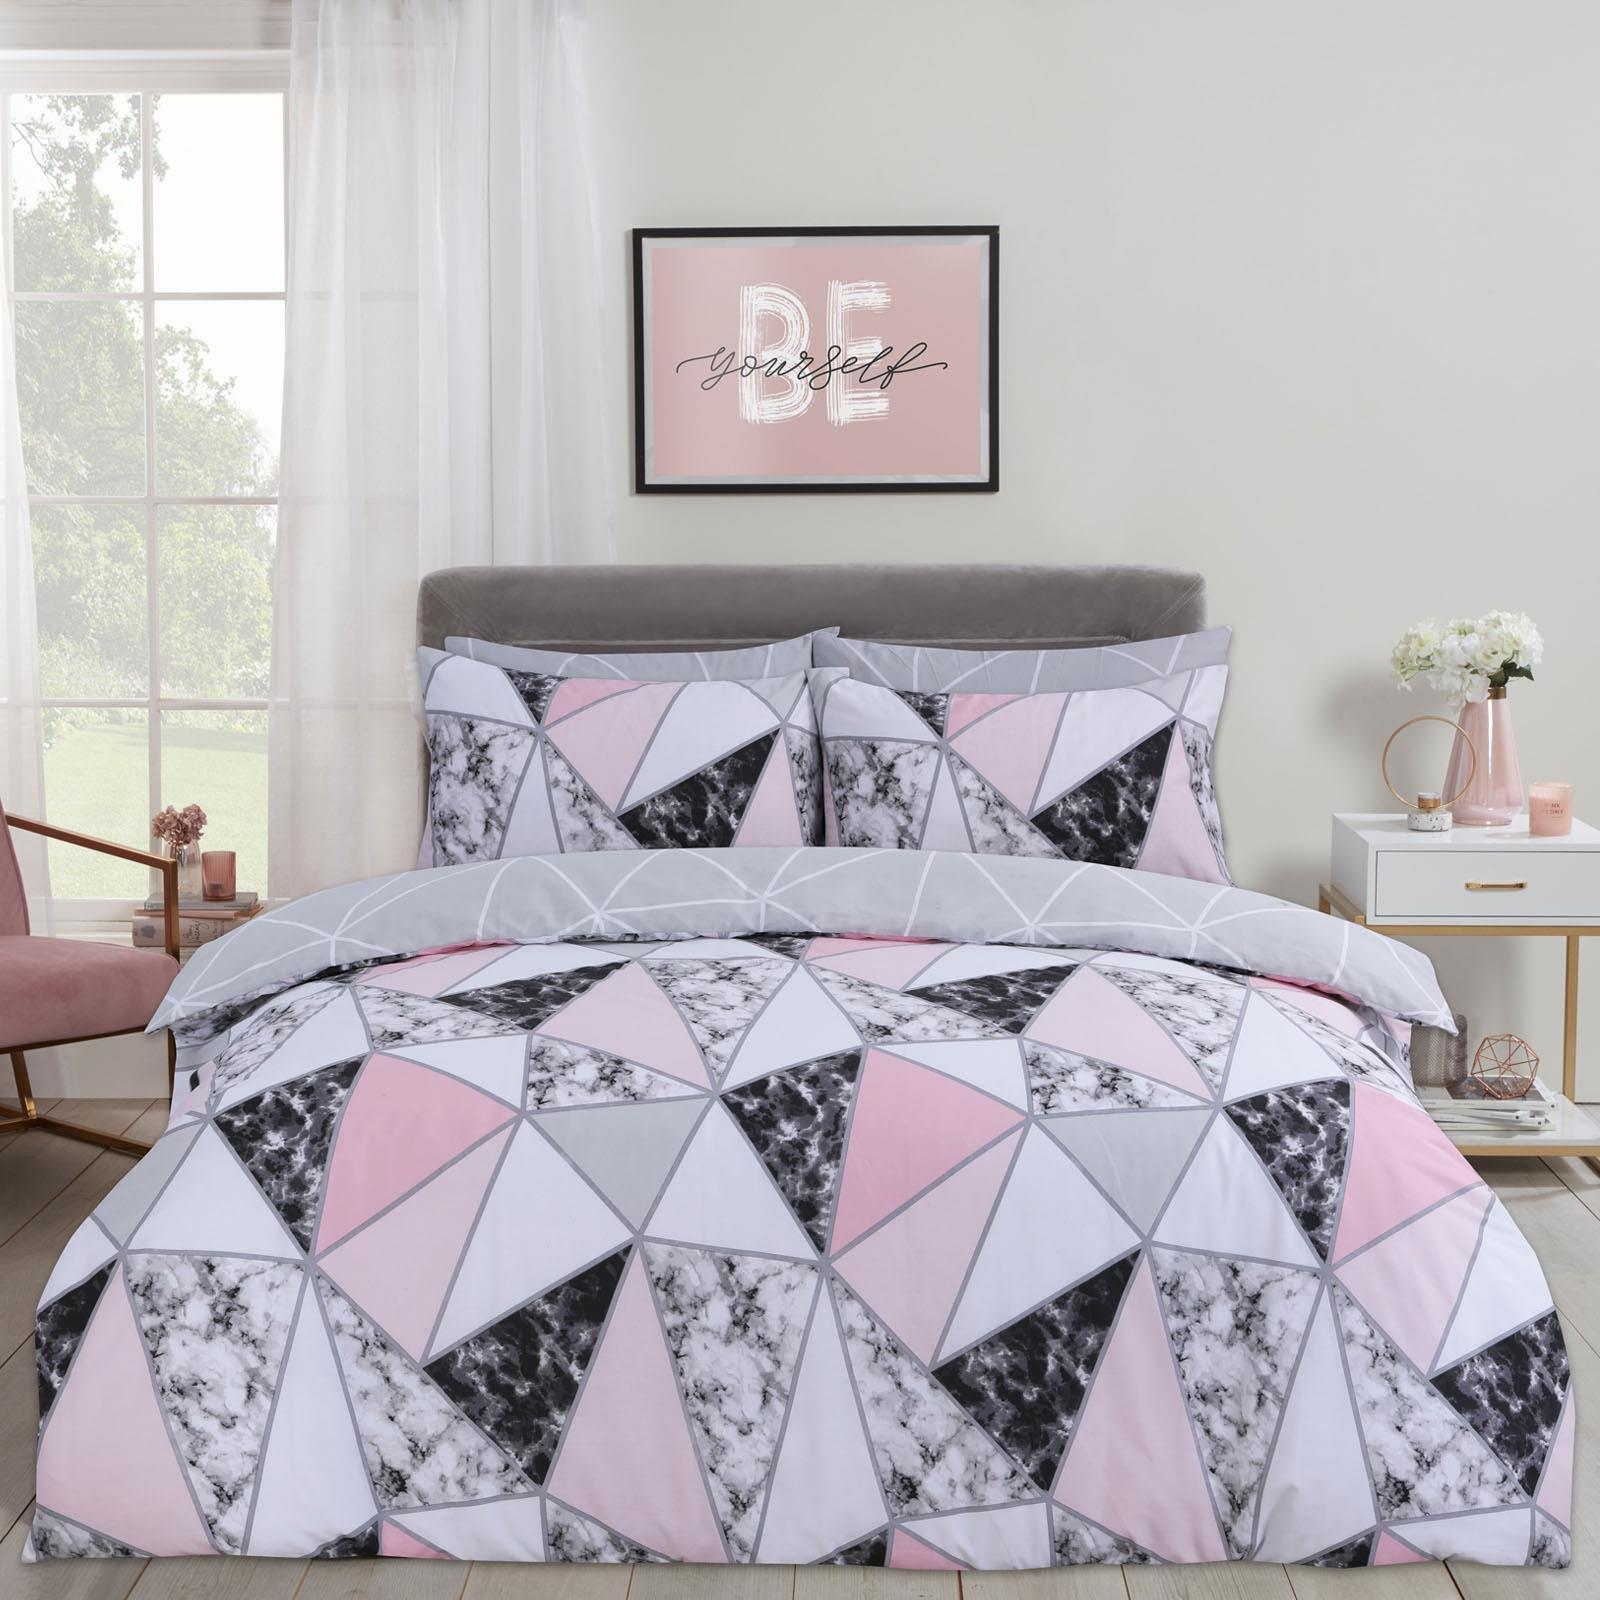 thumbnail 2 - Dreamscene Marble Geometric Duvet Cover with Pillowcase Bedding Set Grey Blush